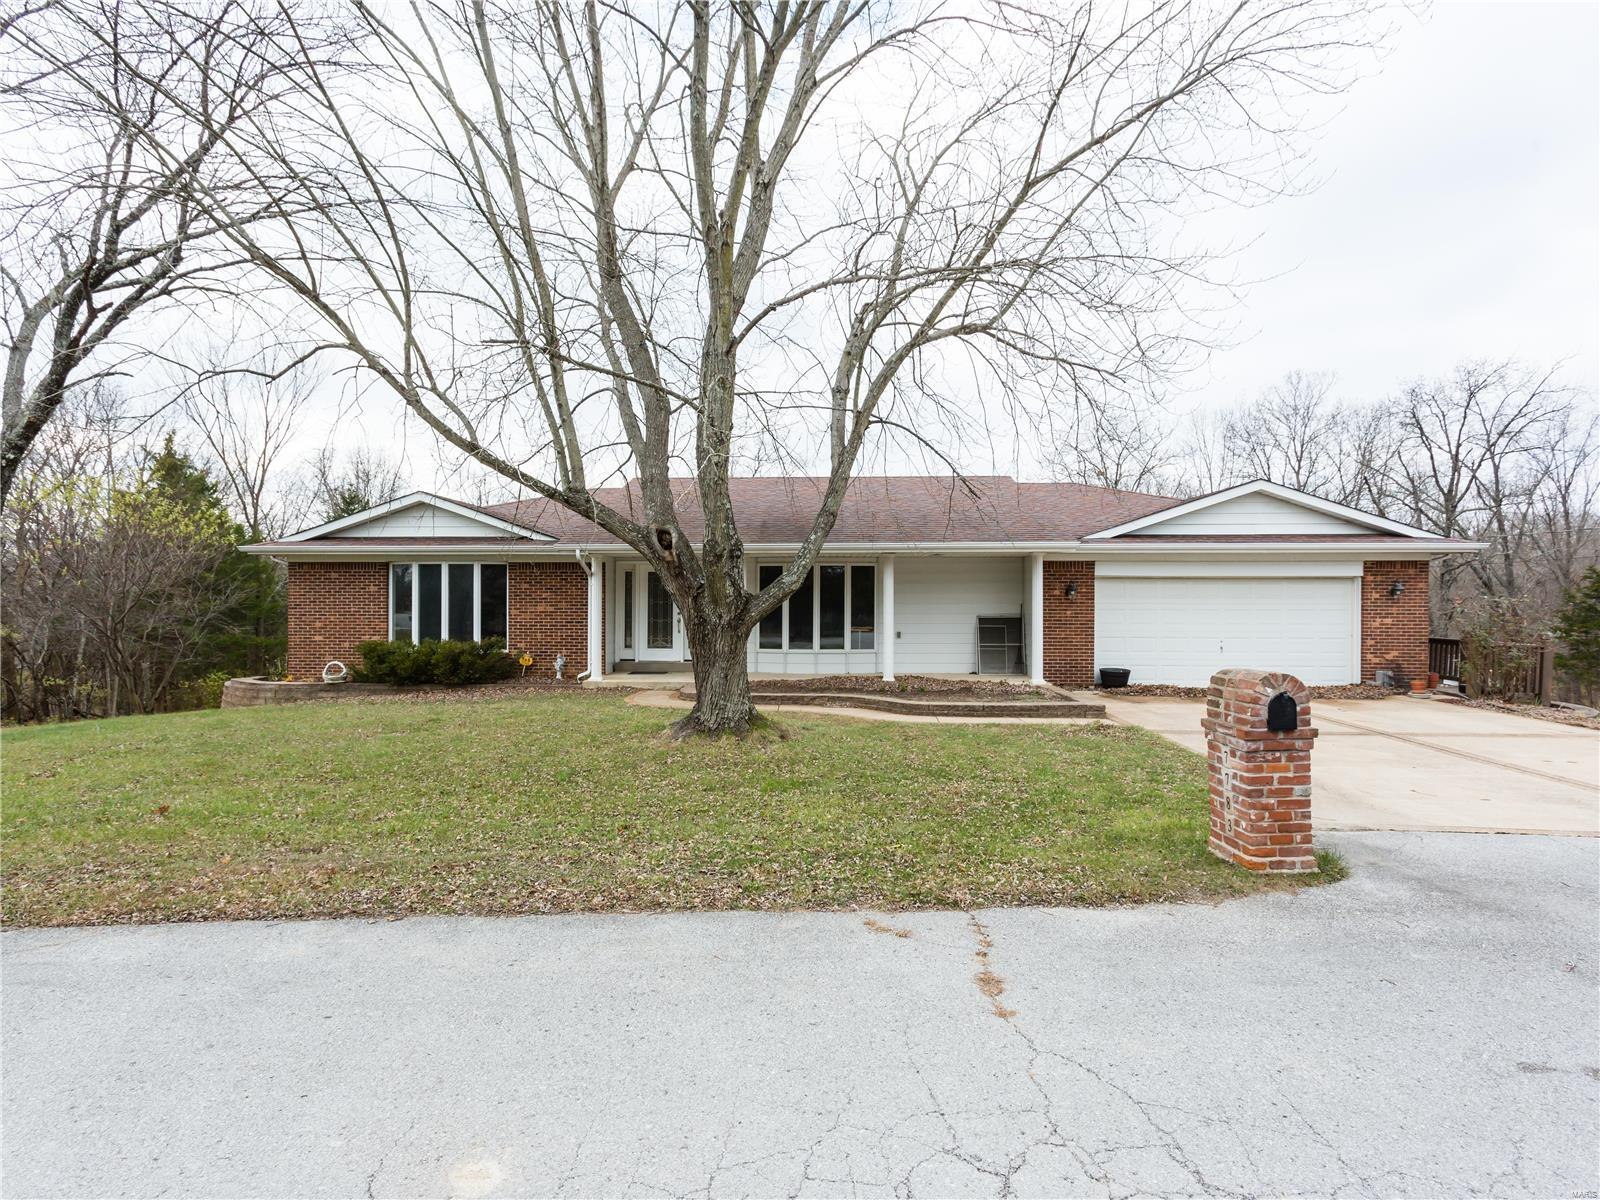 7783 Ashwood Property Photo - Barnhart, MO real estate listing